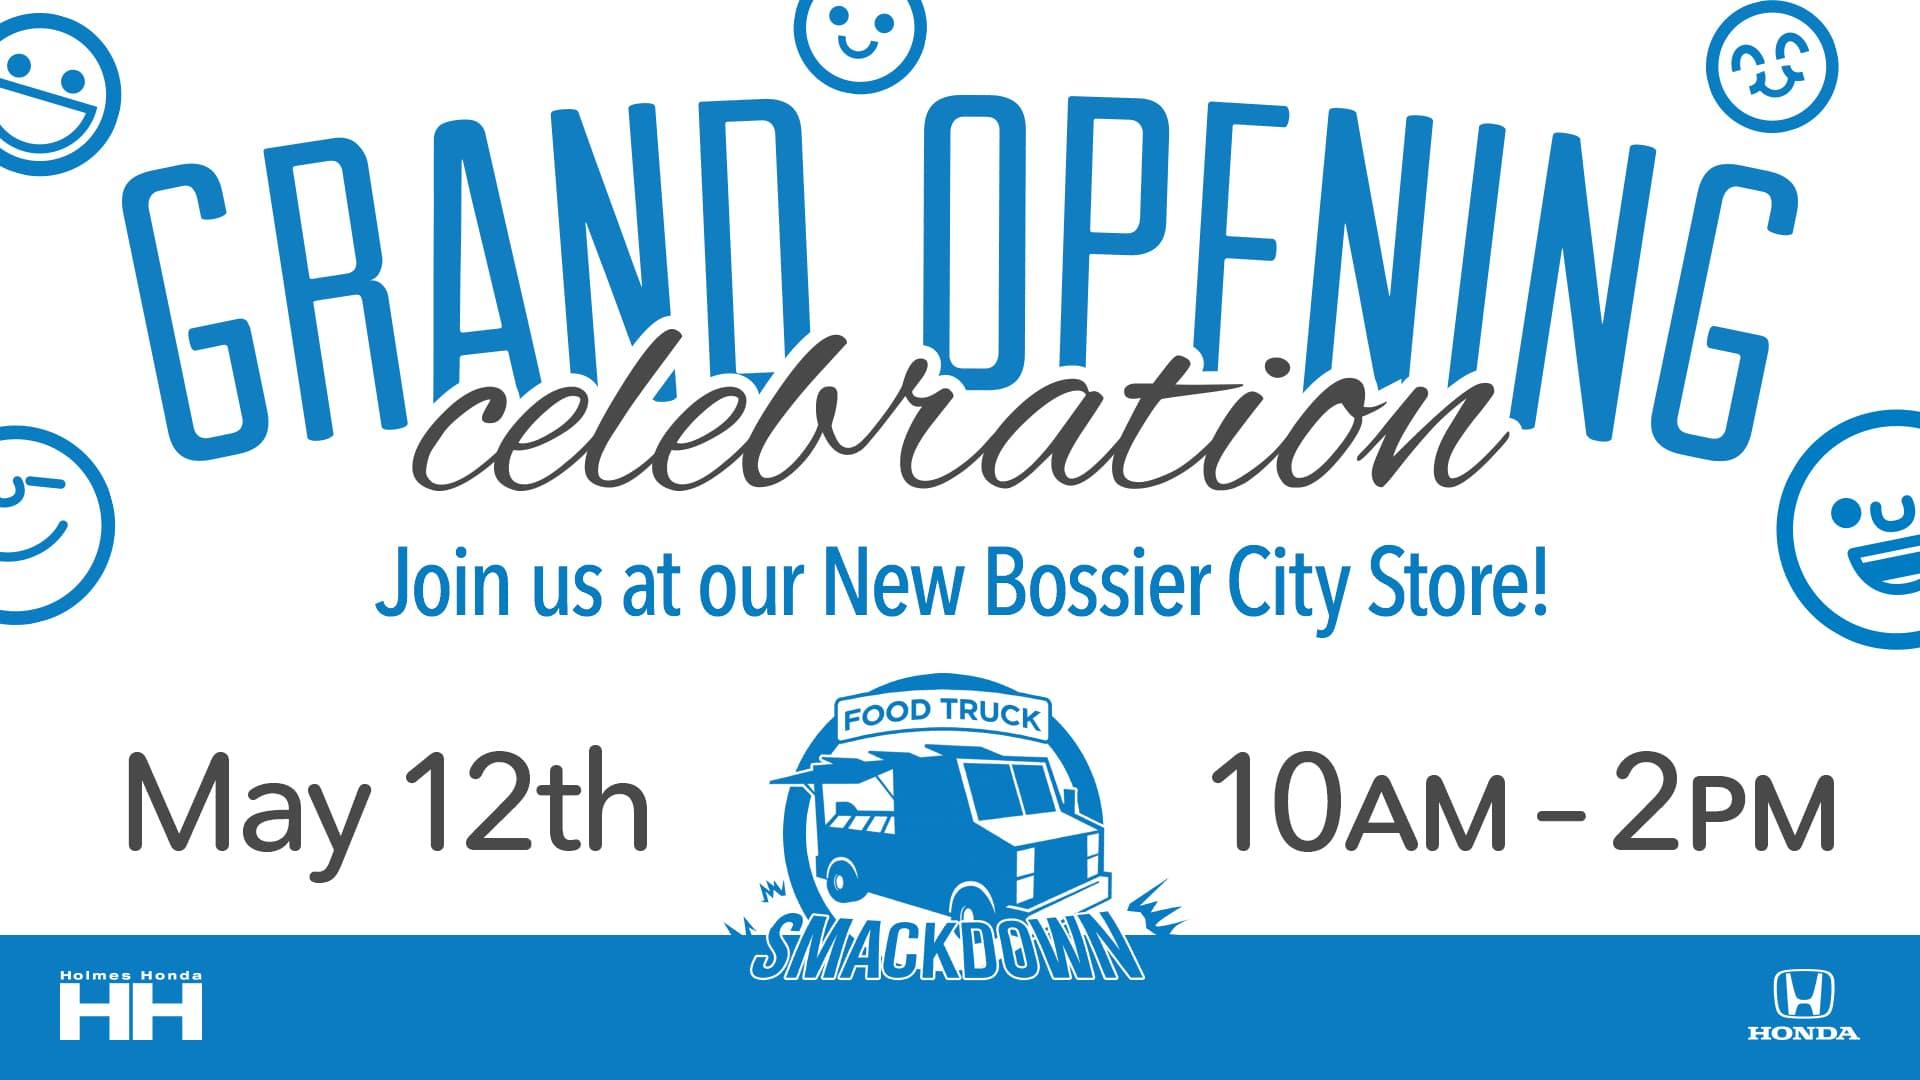 Holmes Honda Bossier City, Grand Opening, Food Truck Smackdown, Honda